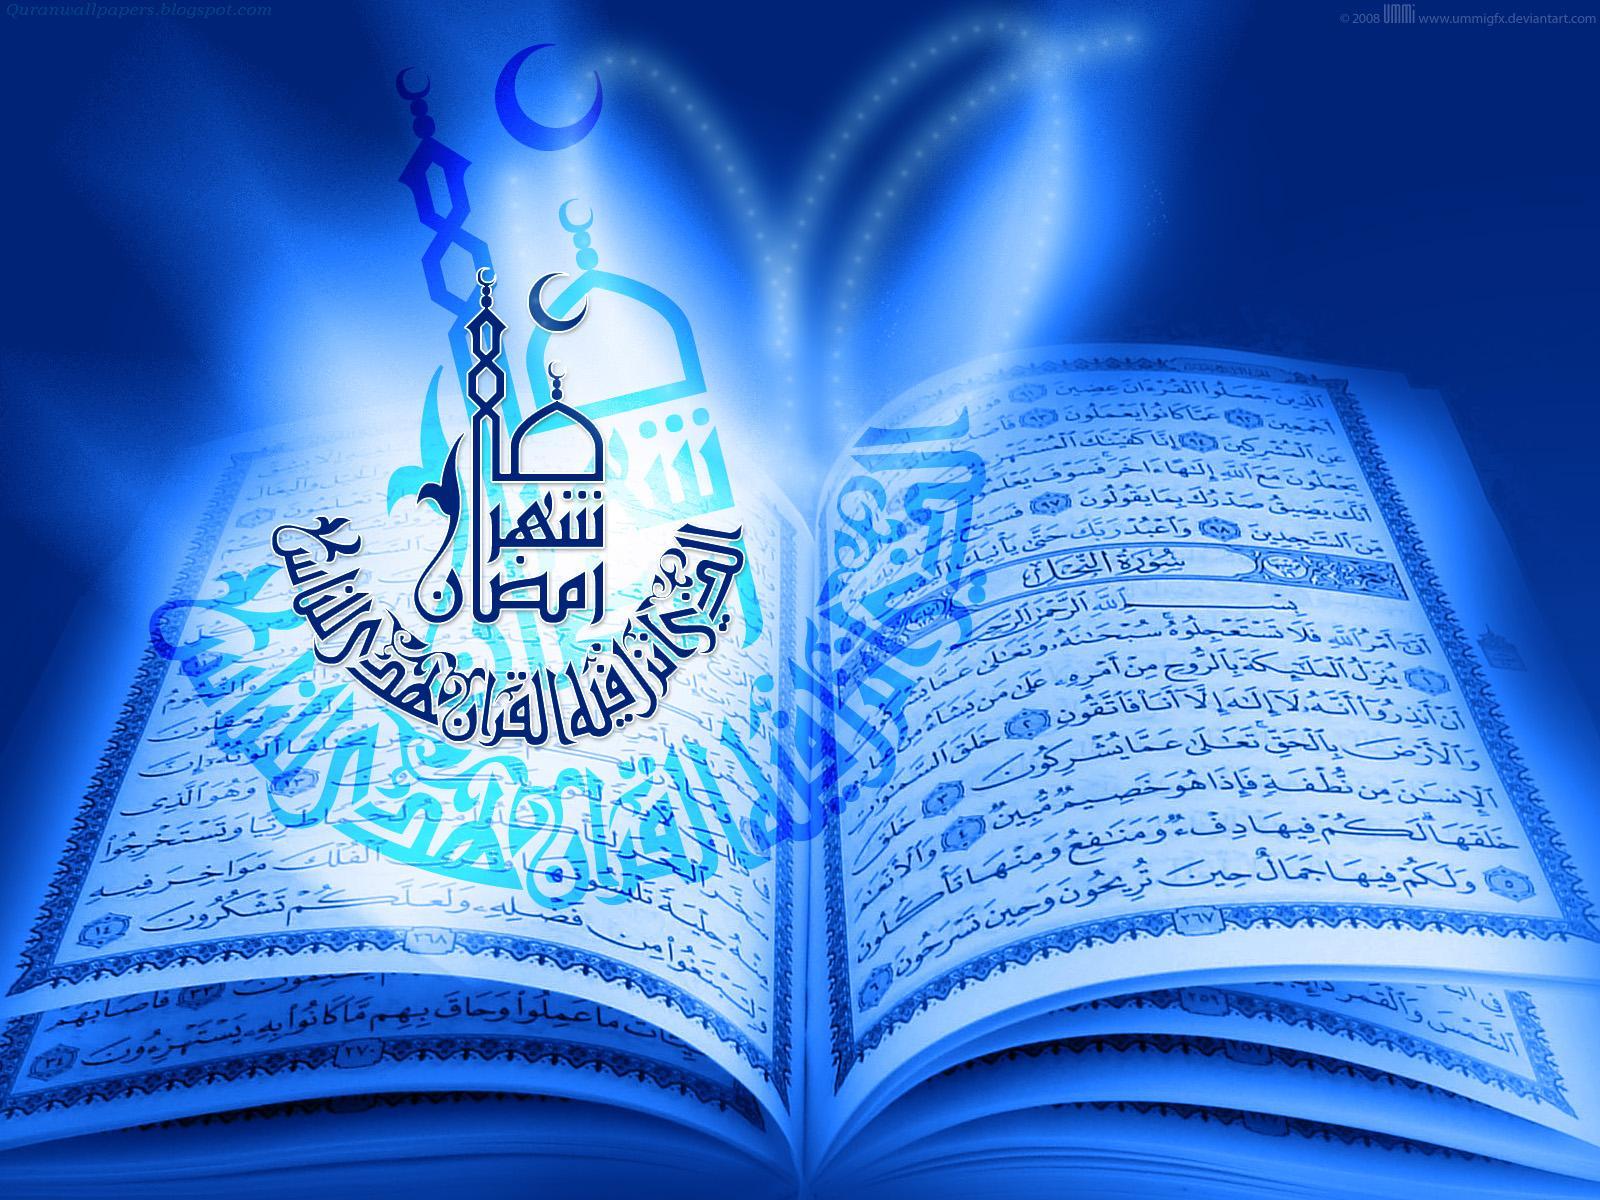 http://4.bp.blogspot.com/-mbNDbtozj0Q/TjVYLbN7-DI/AAAAAAAAABw/aabxHIP9vLE/s1600/Salaam_Ramadan_ISLAM_QURAN_WALLPAPERS_2011.jpg